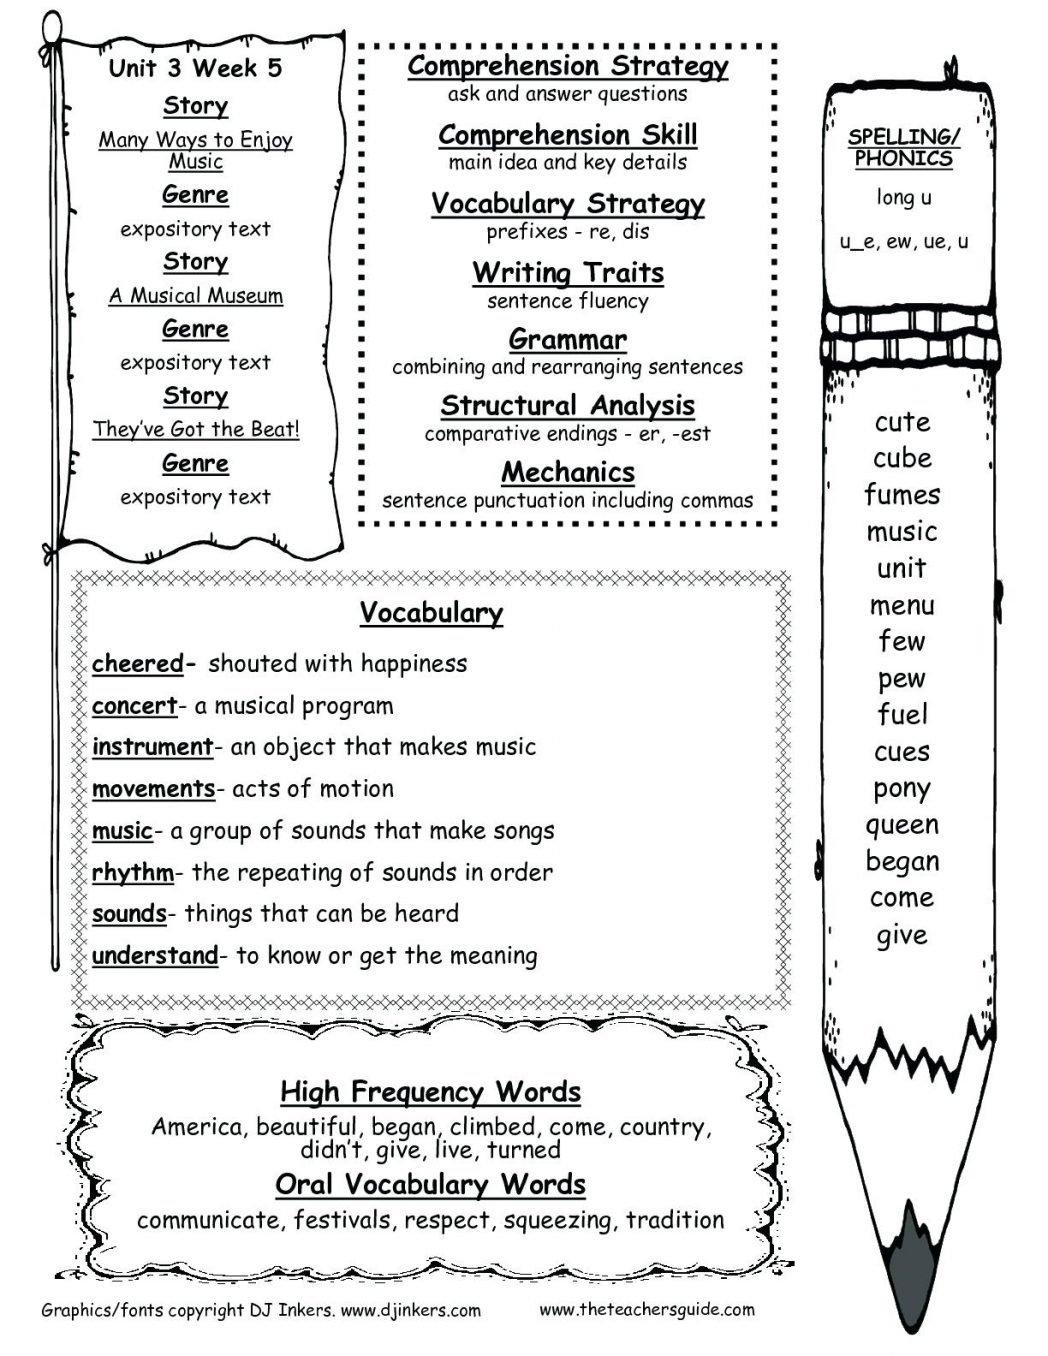 10 Great Main Idea Worksheets 5Th Grade worksheet main idea worksheets multiple choice context clues 5th 2 2021